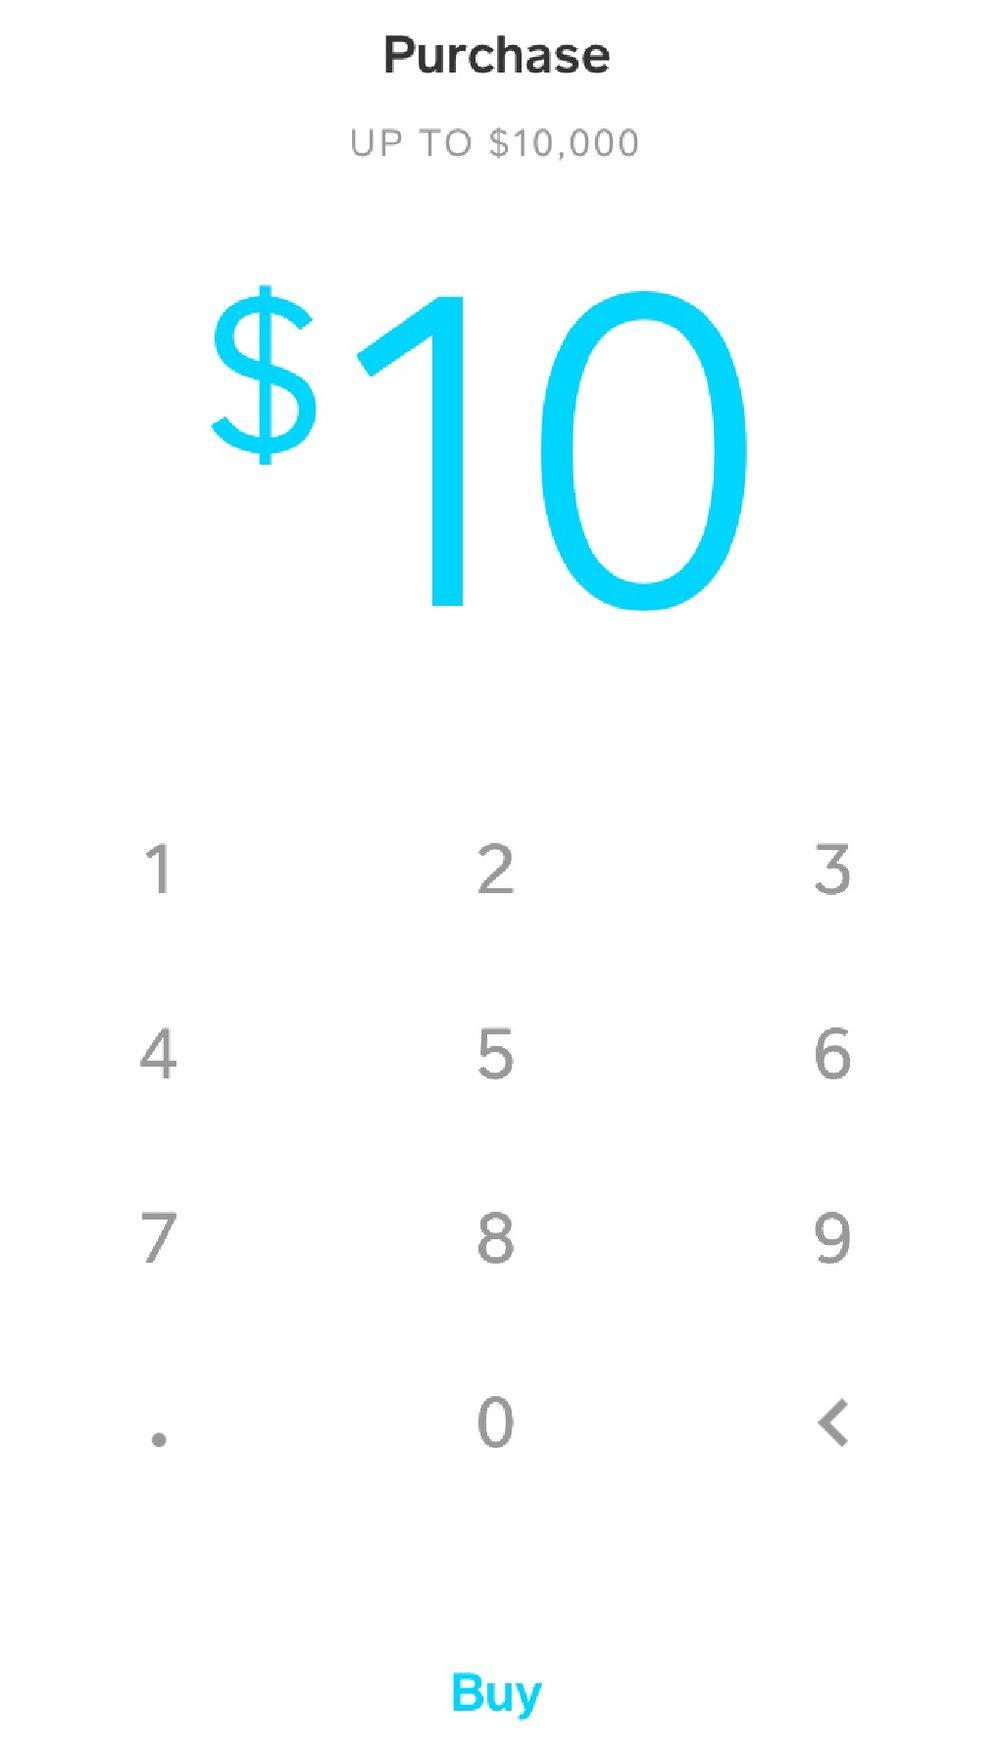 6. Buy Bitcoin